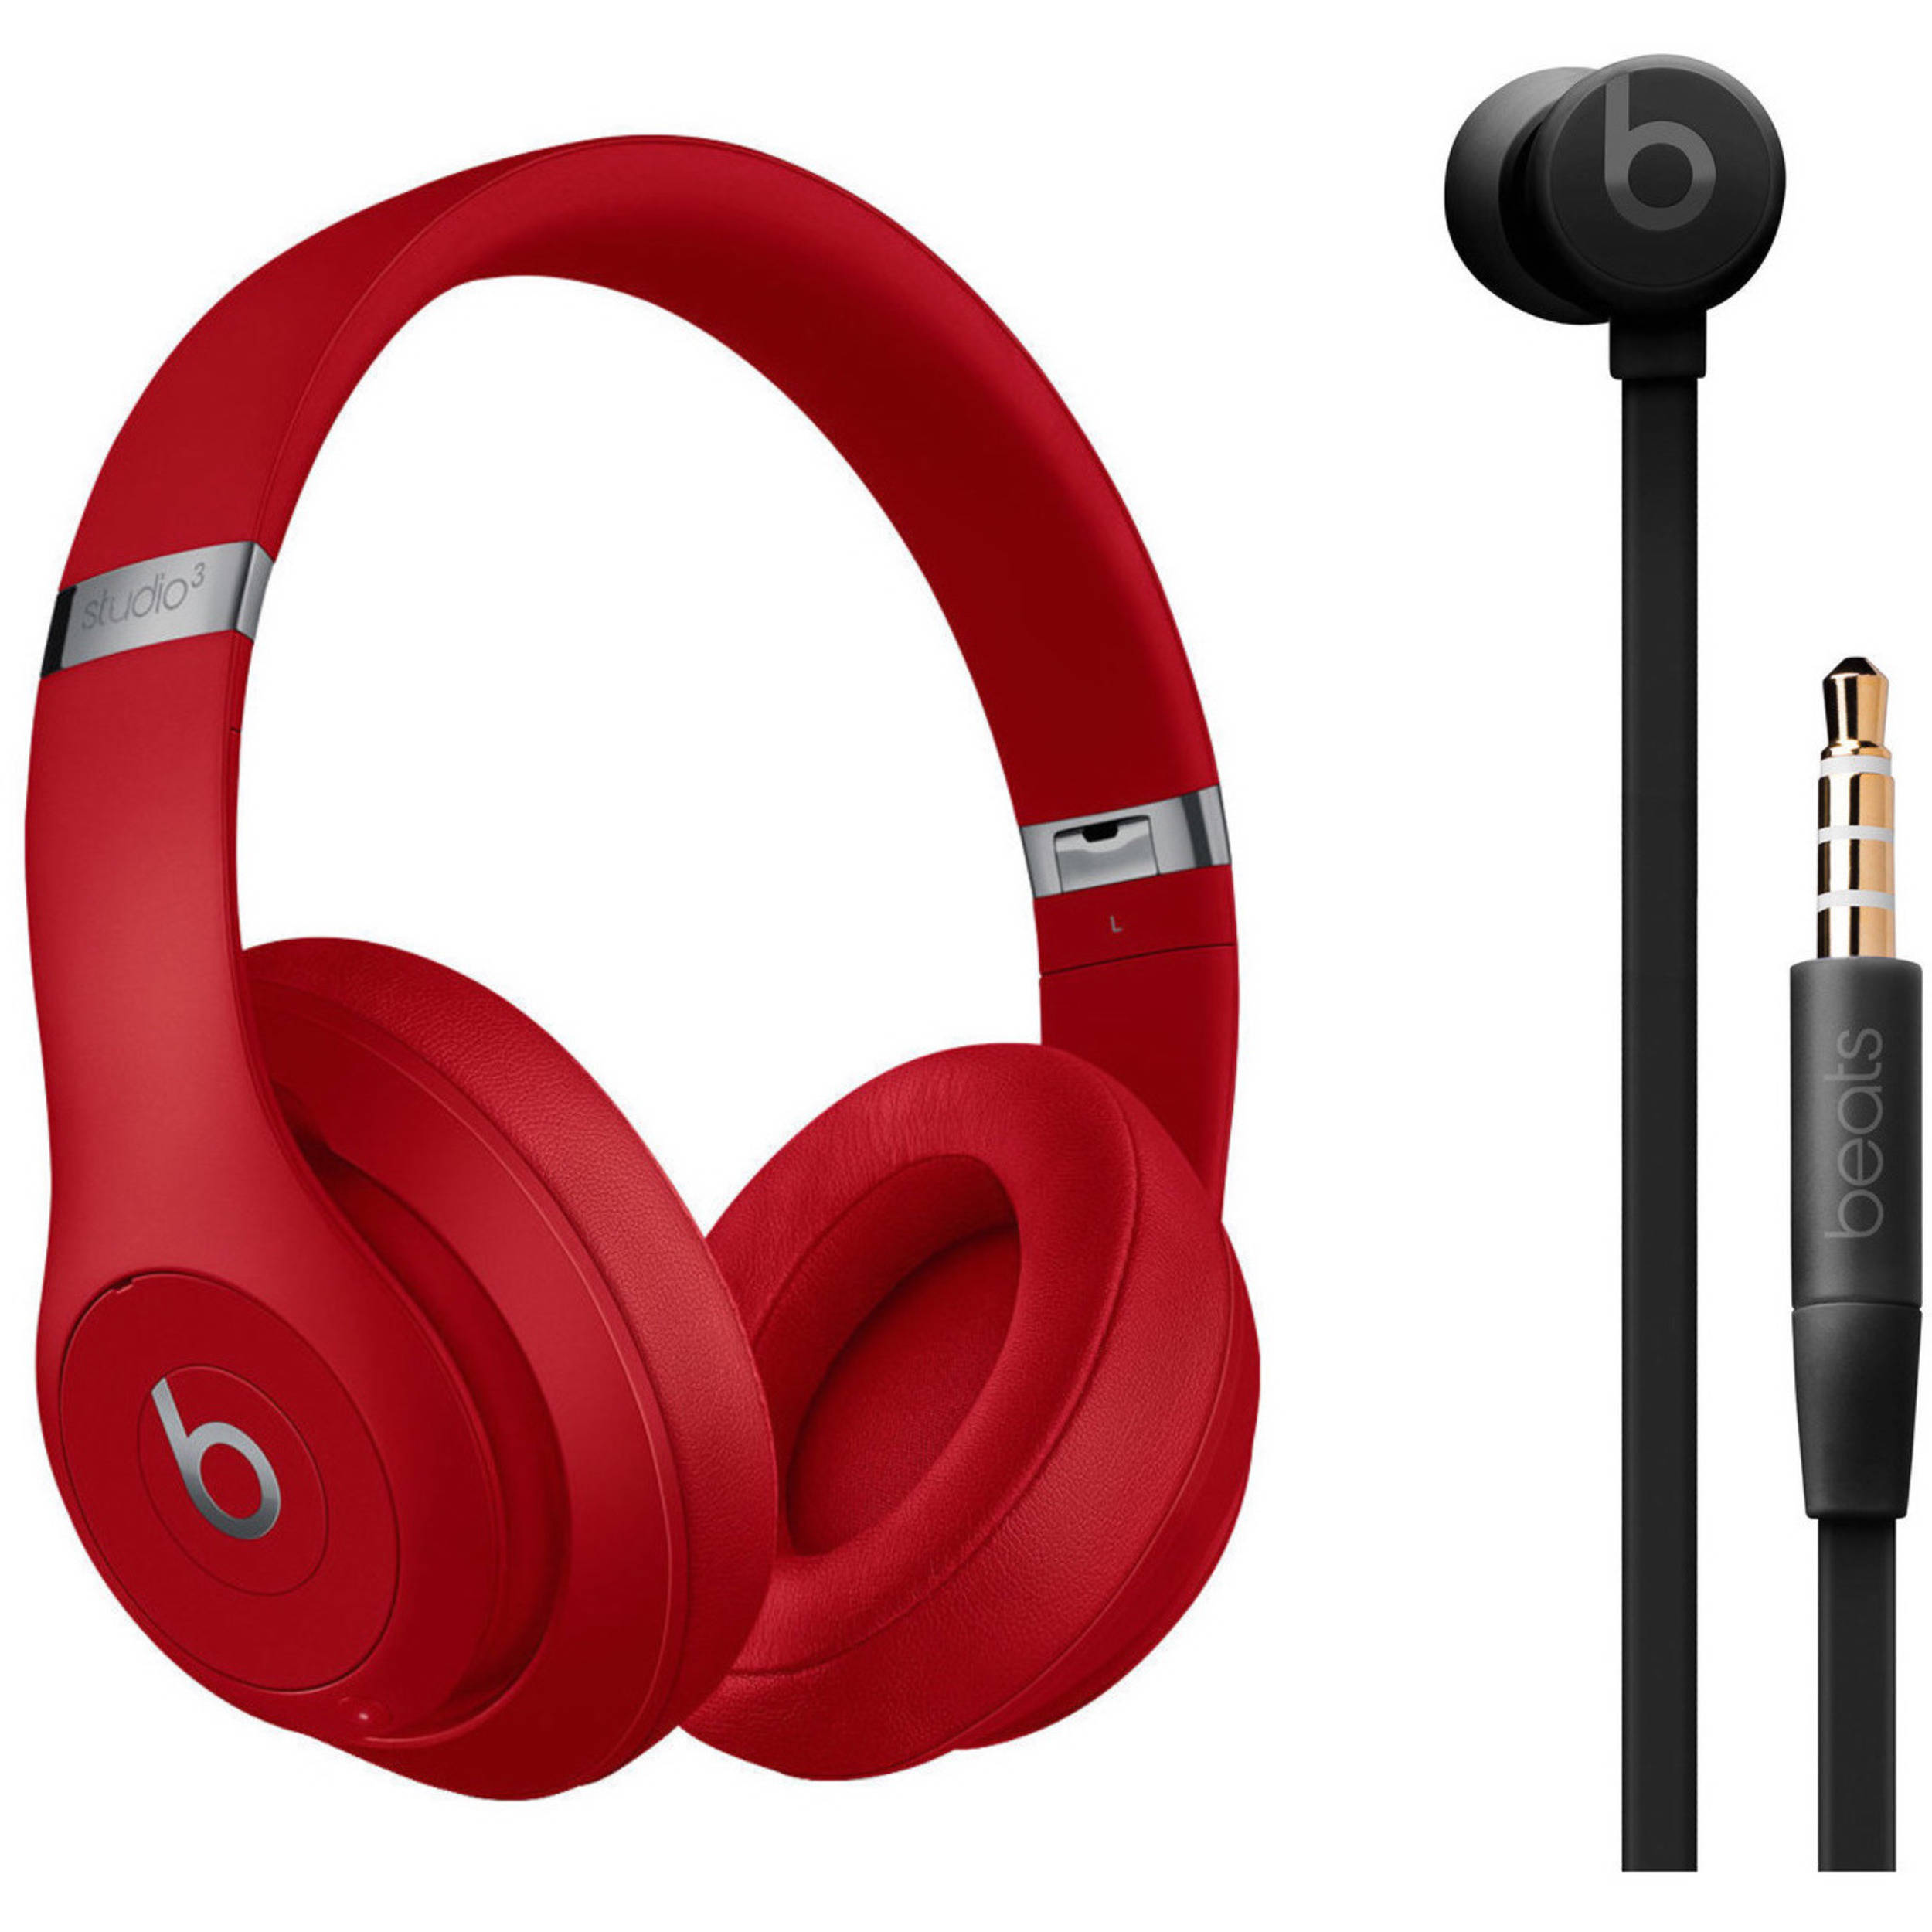 4124da93e07 Beats by Dr. Dre Studio3 Wireless Noise-Canceling Headphones